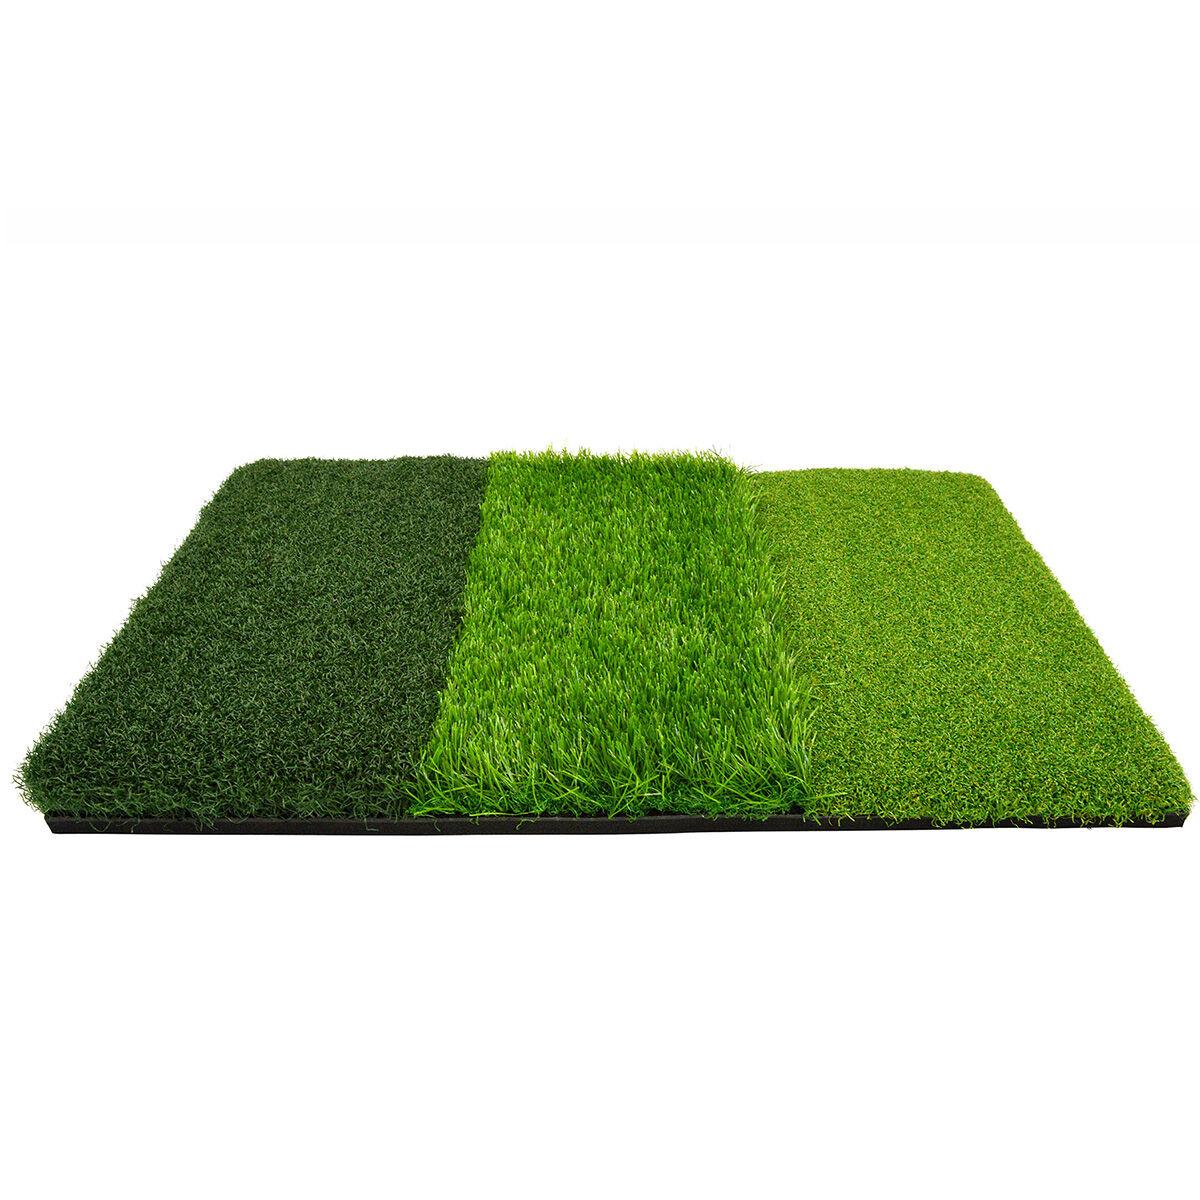 ON PAR Tri Turf Mat, Male, One size, Green | American Golf